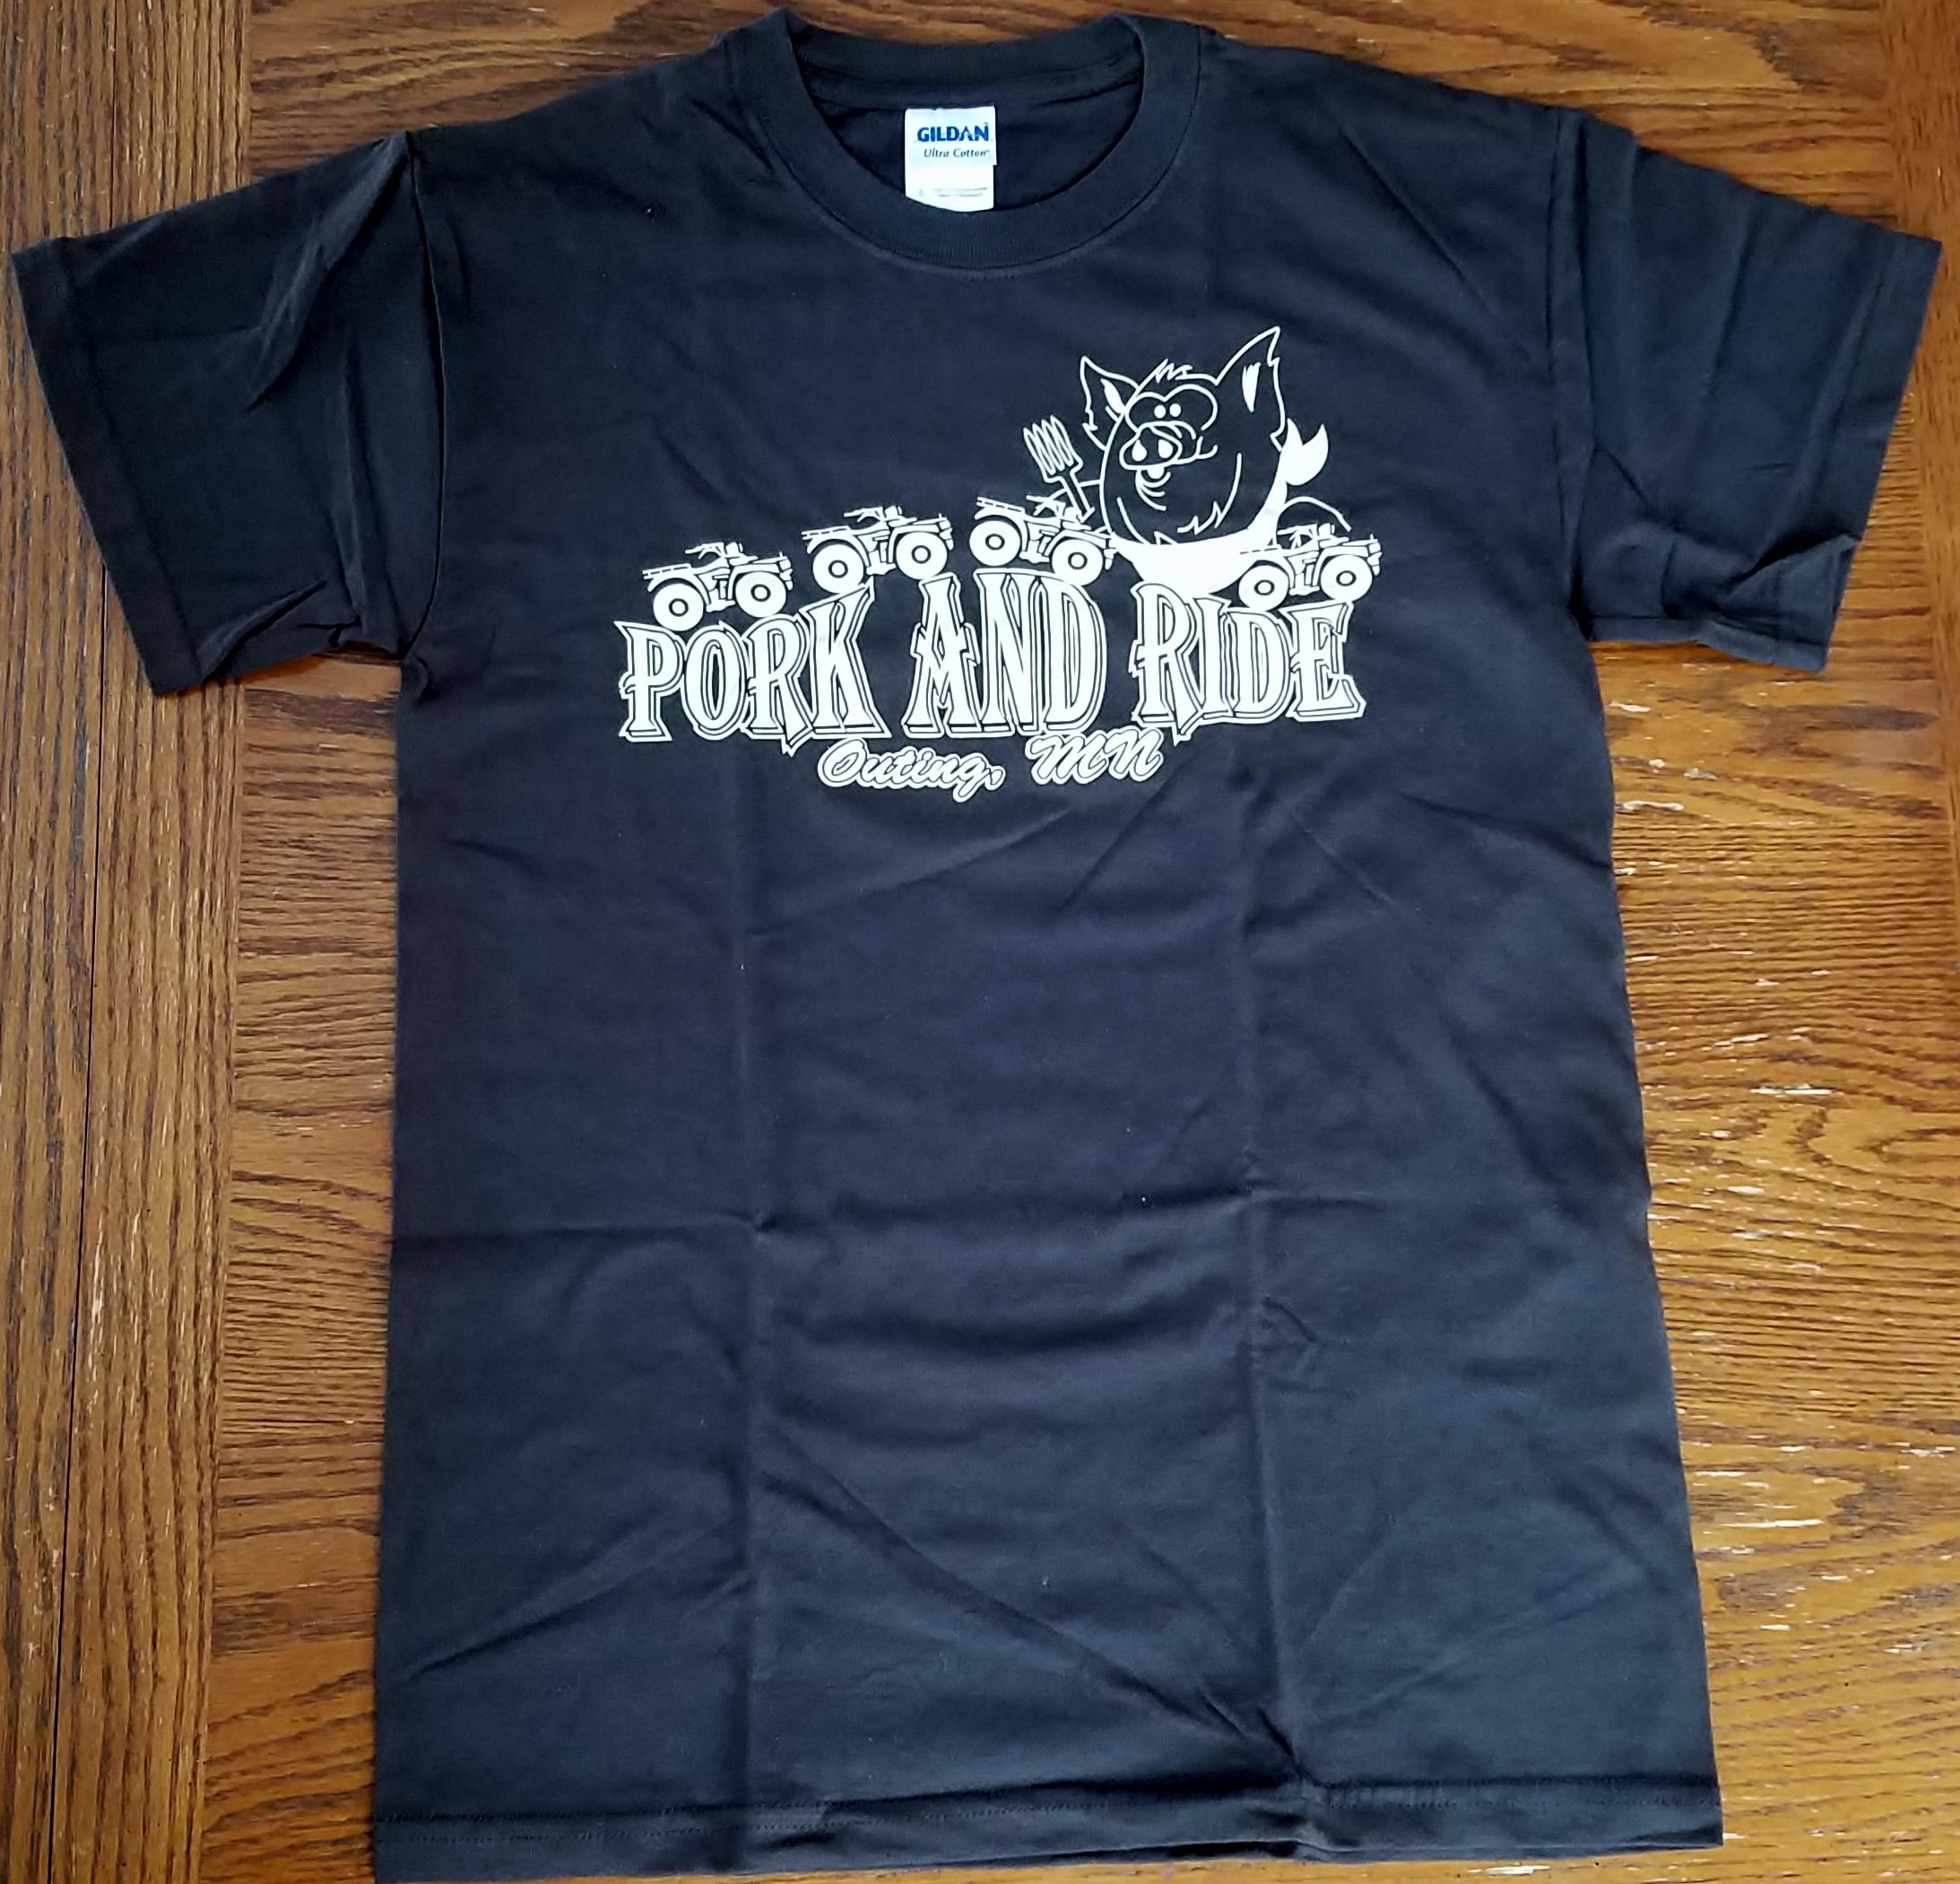 Pork-N-Ride Short Sleeve T-Shirts - Brown